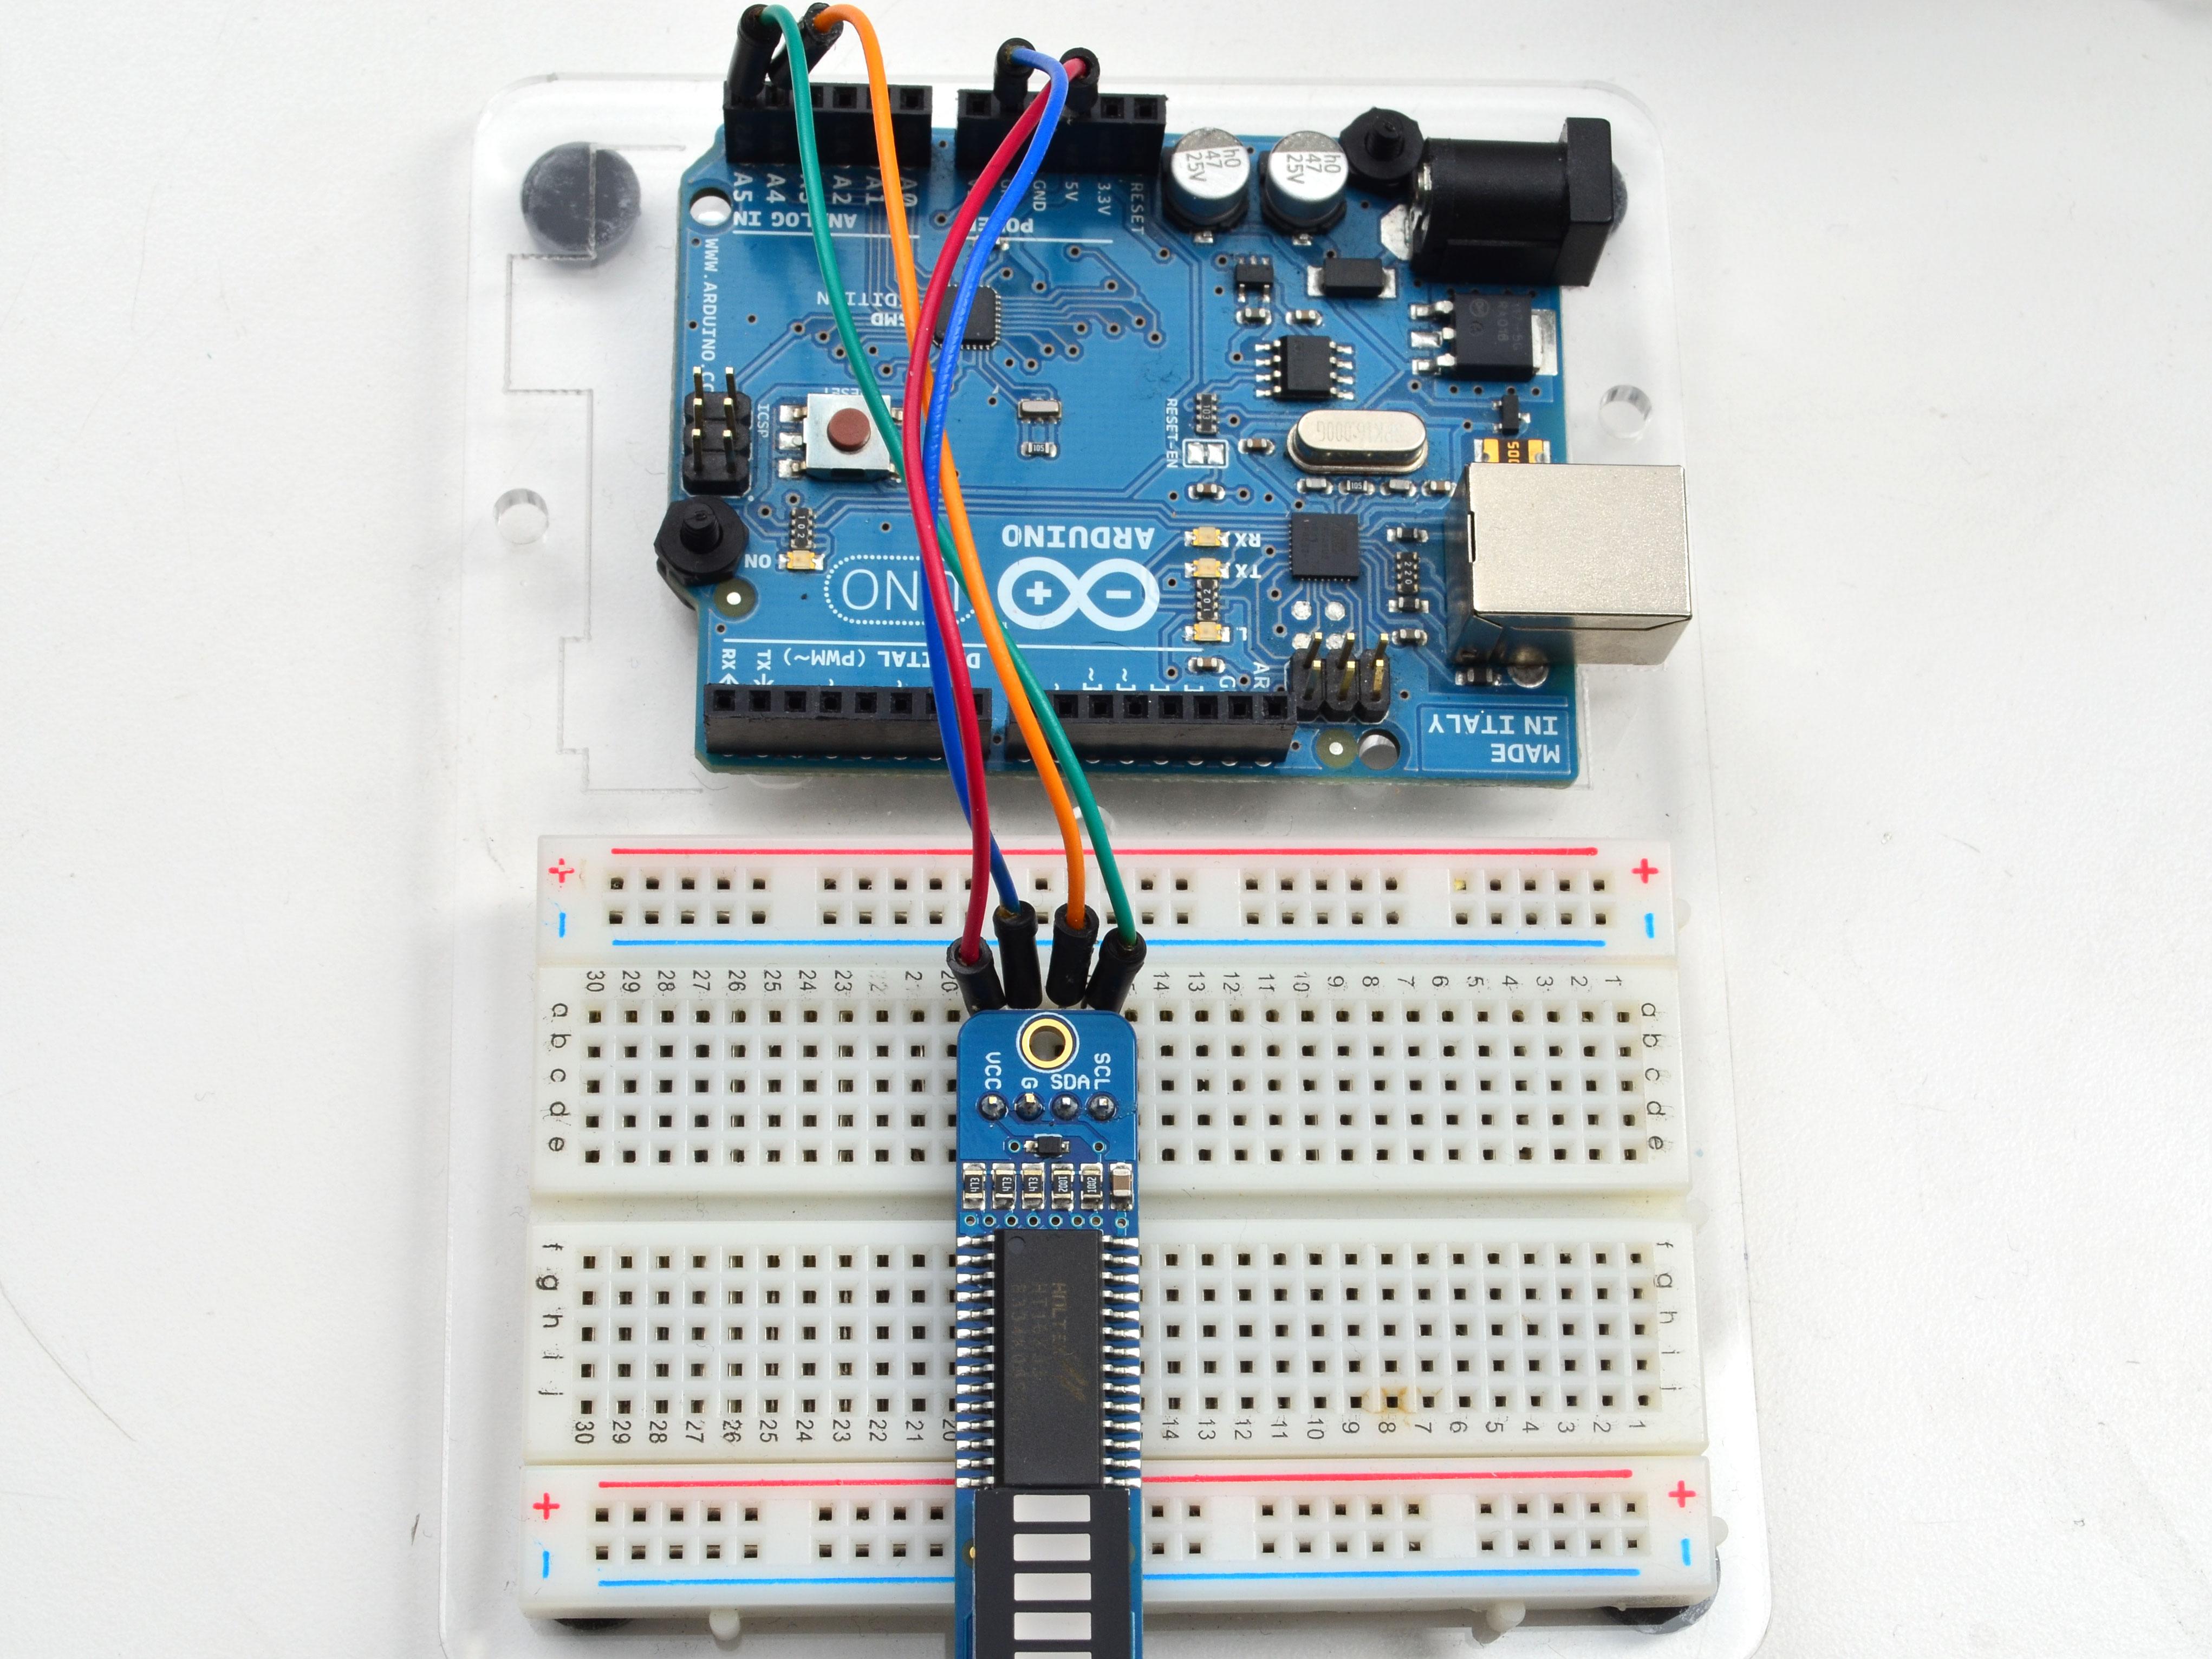 led_matrix_wiring.jpg